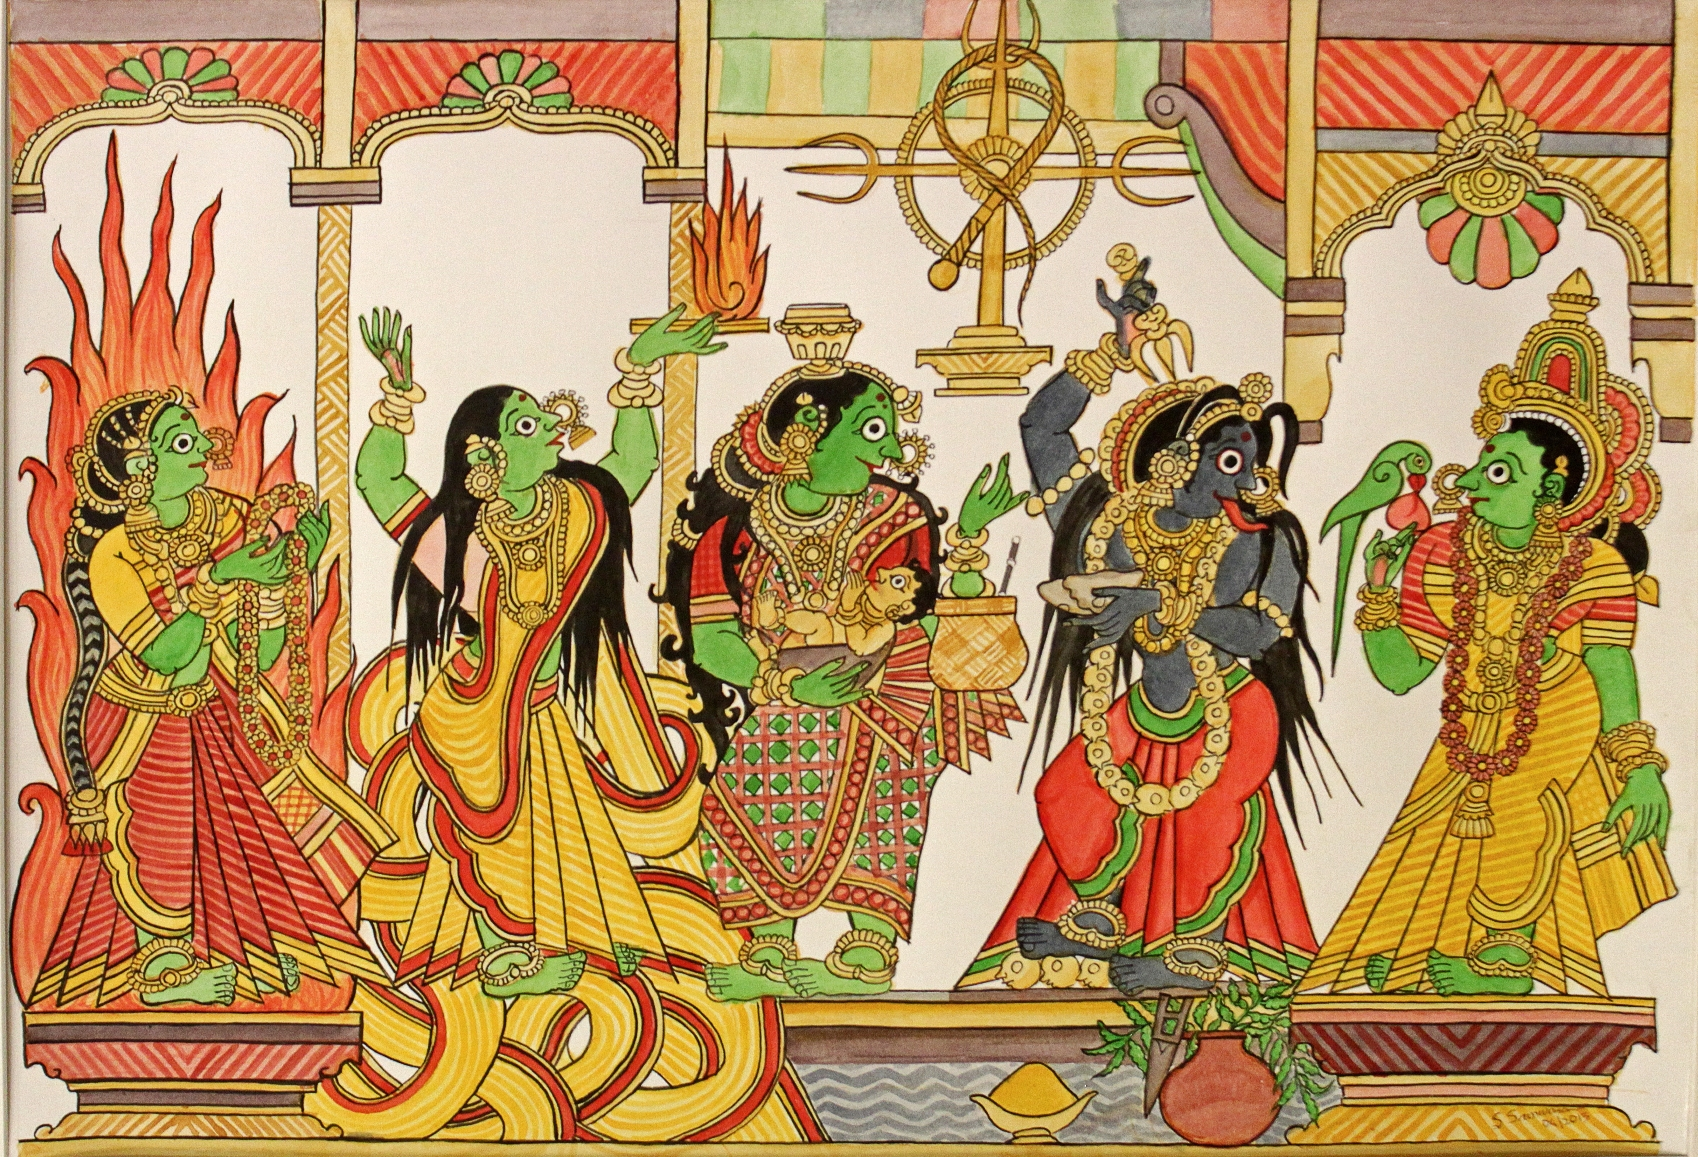 'Draupadi in Five Forms' by Balaji Srinivasan, inspired by Chitrakathi